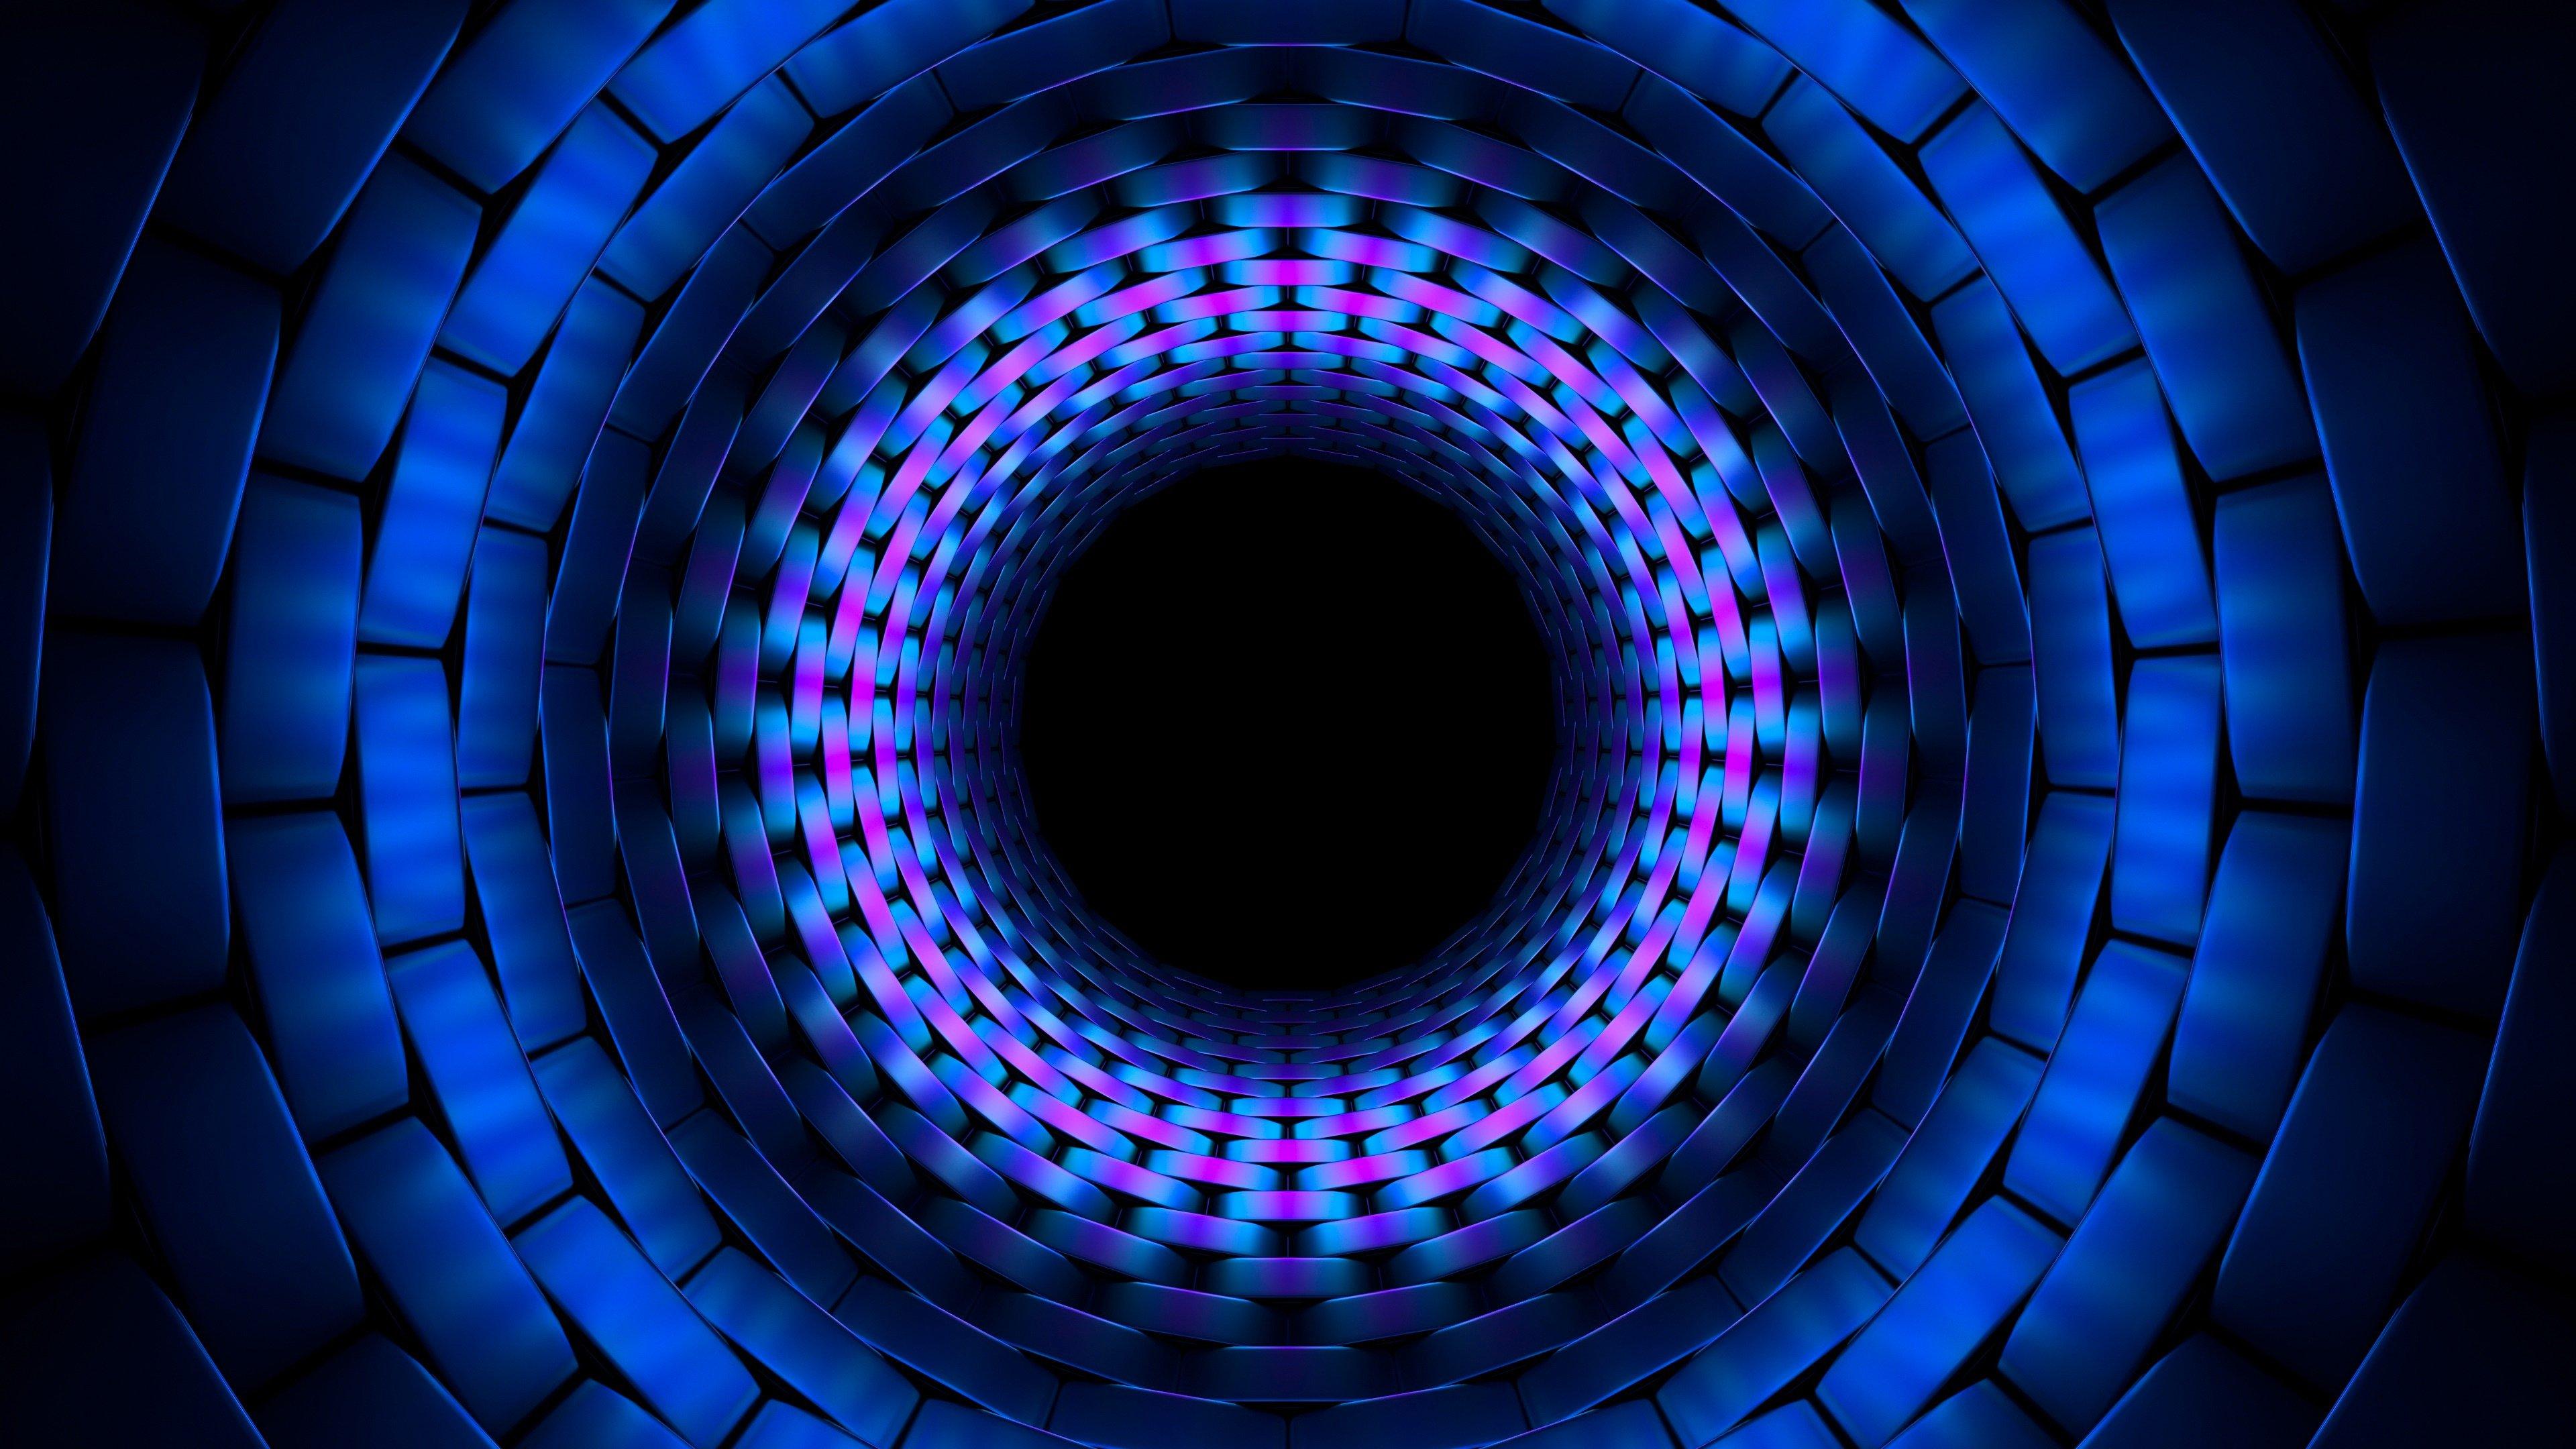 Fondos de pantalla Fractal de círculo en tunel azul 3D